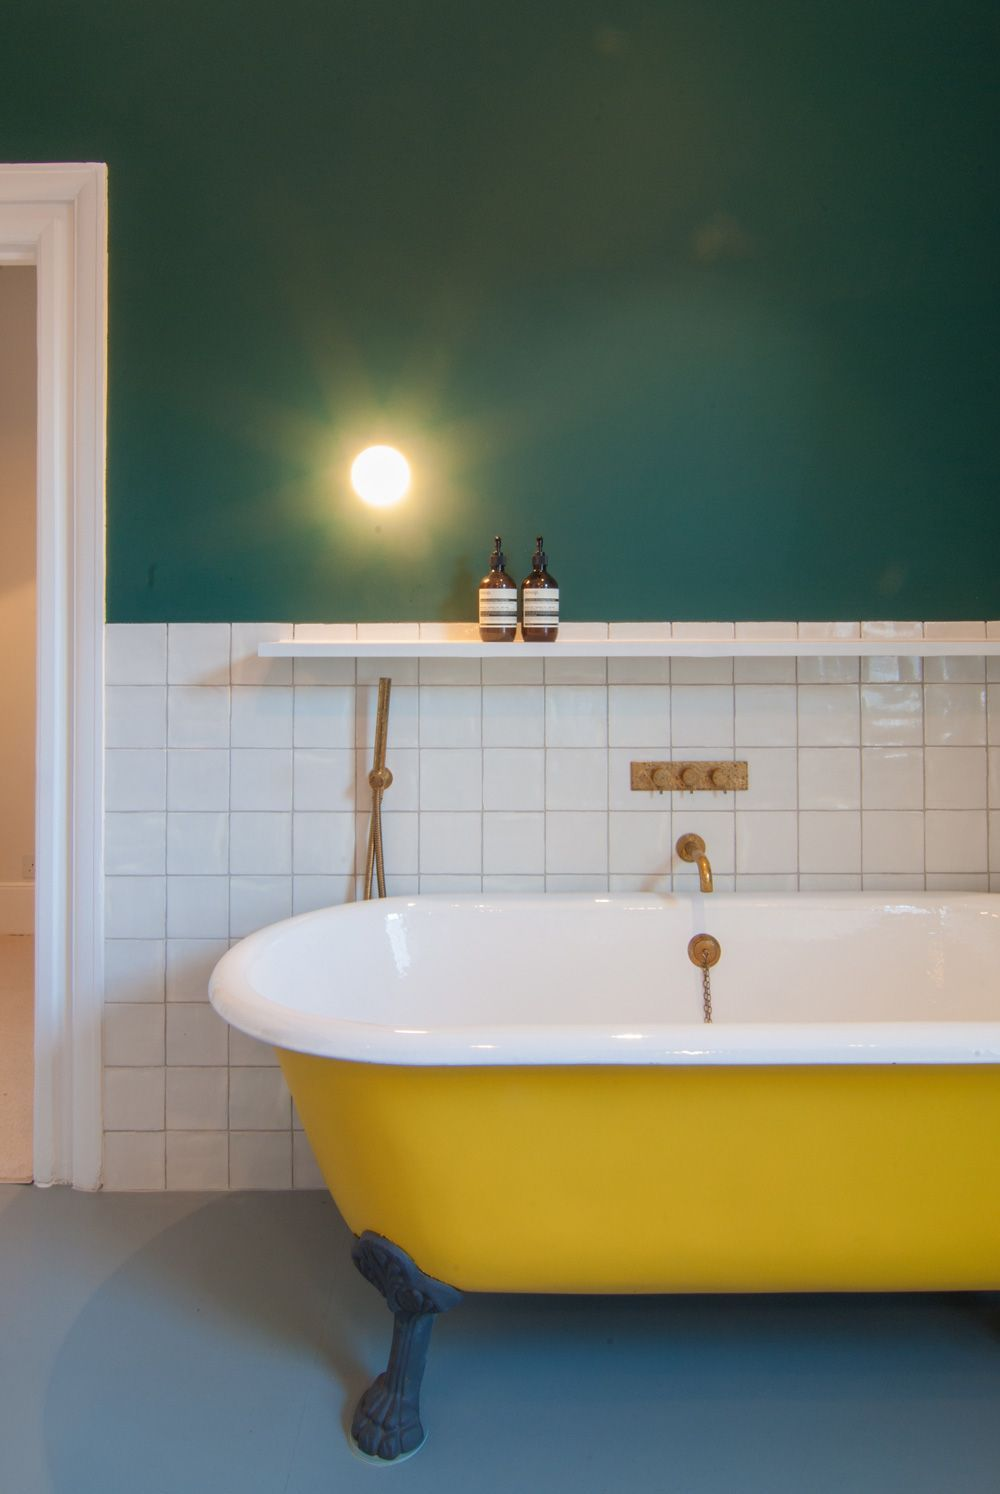 Leytonstone Renovation Teal Bathroom Yellow Bath Brass Yellow Bathroom Decor Yellow Bathrooms Teal Bathroom